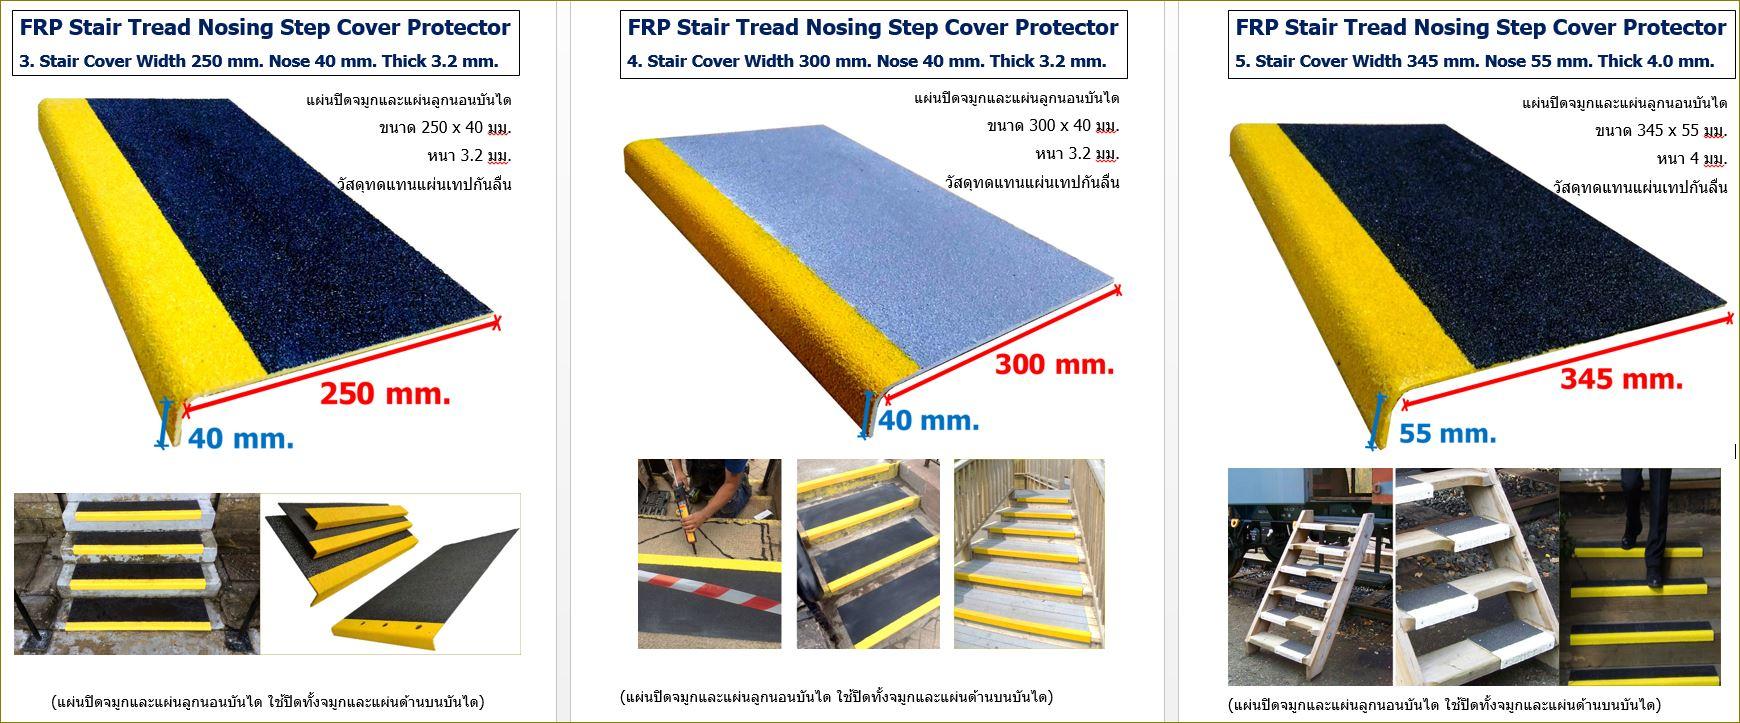 Stair Tread Nosing Step Cover Anti-Slip Sheeting #ทดแทนแผ่นเทปกันลื่น